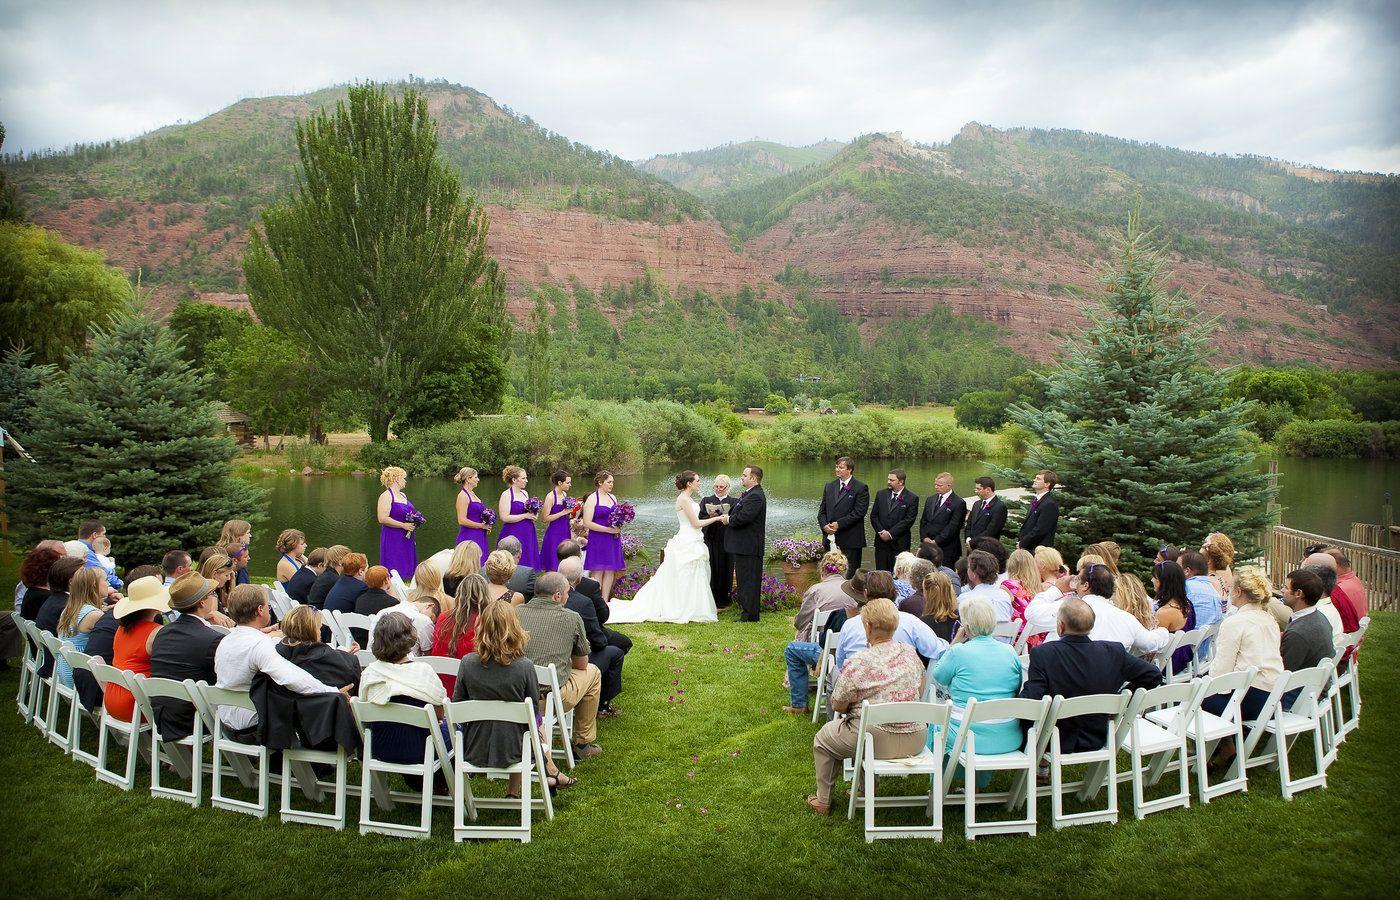 Pin By Travelvision On Amazing Wedding Venues Colorado Wedding